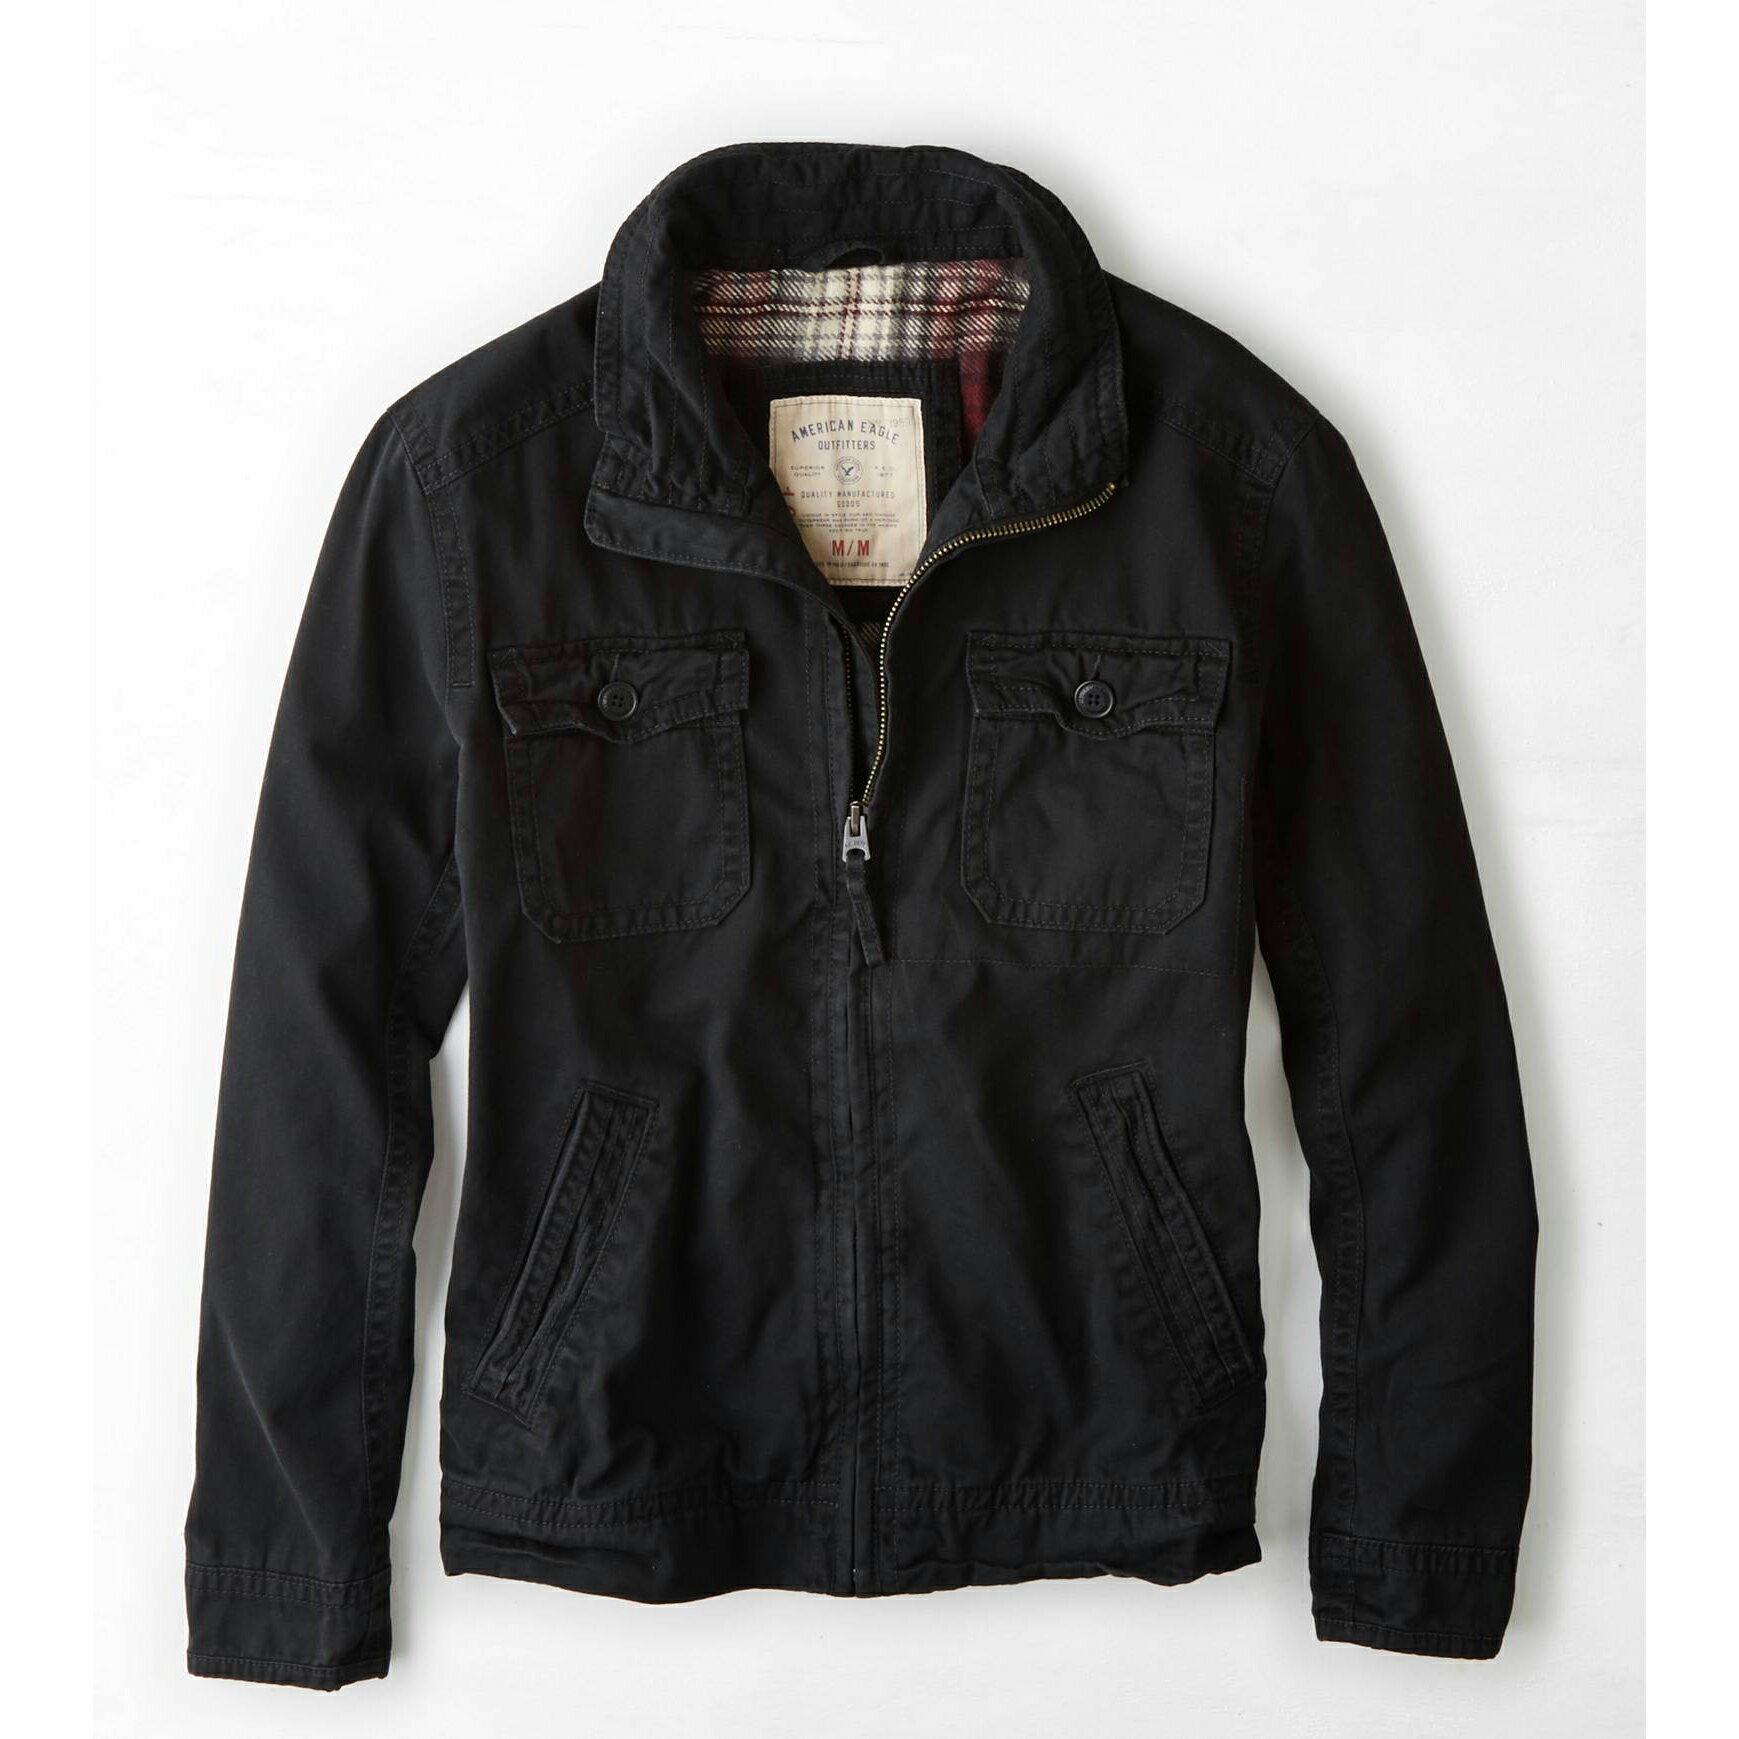 美國百分百【全新真品】American Eagle AE 老鷹 外套 軍外套 短大衣 夾克 男 黑色 M號 E507